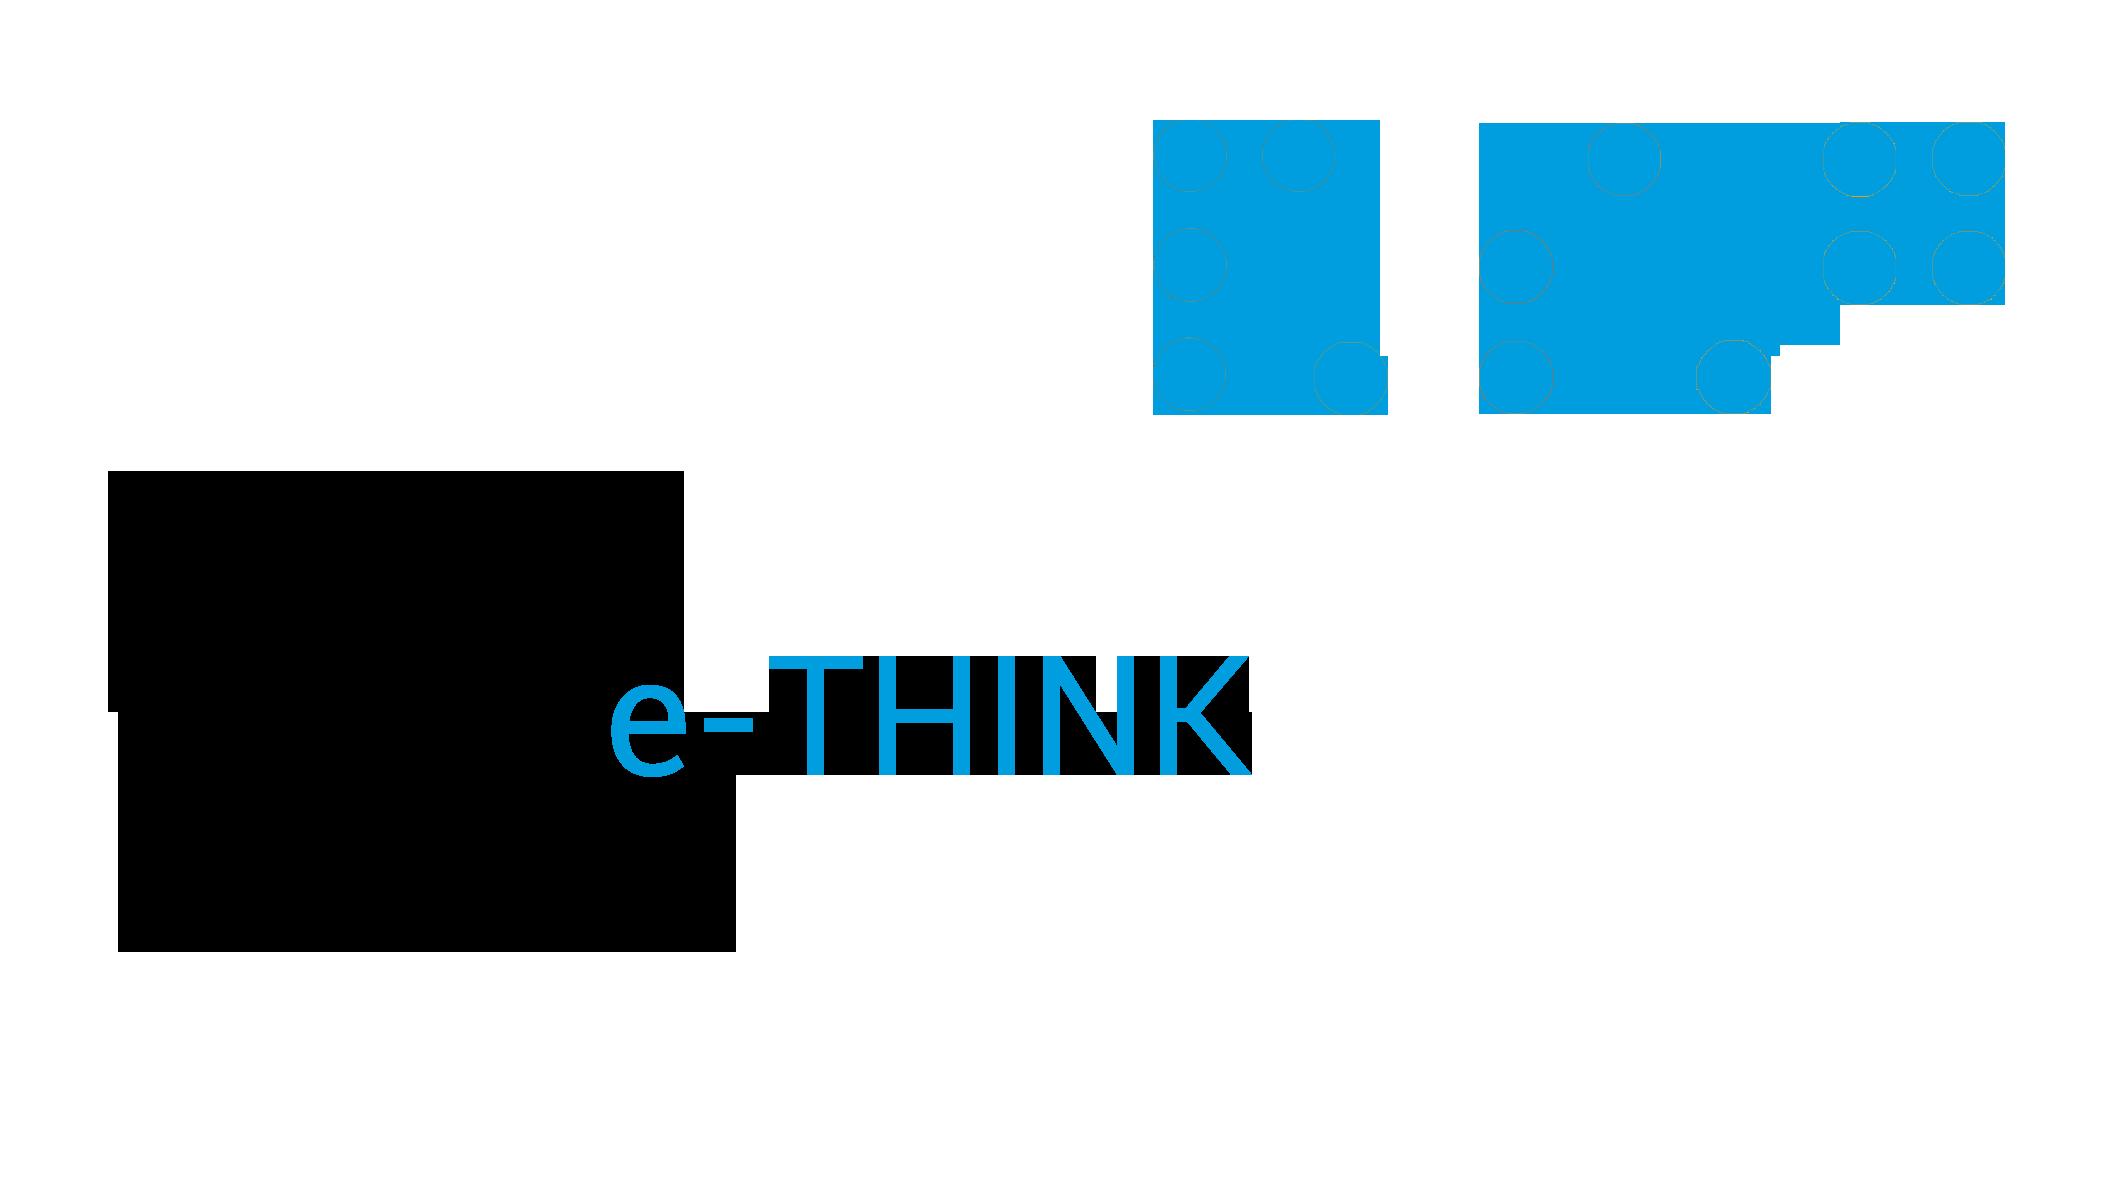 The Mark e-Think Project. Consultoría de Marketing Digital